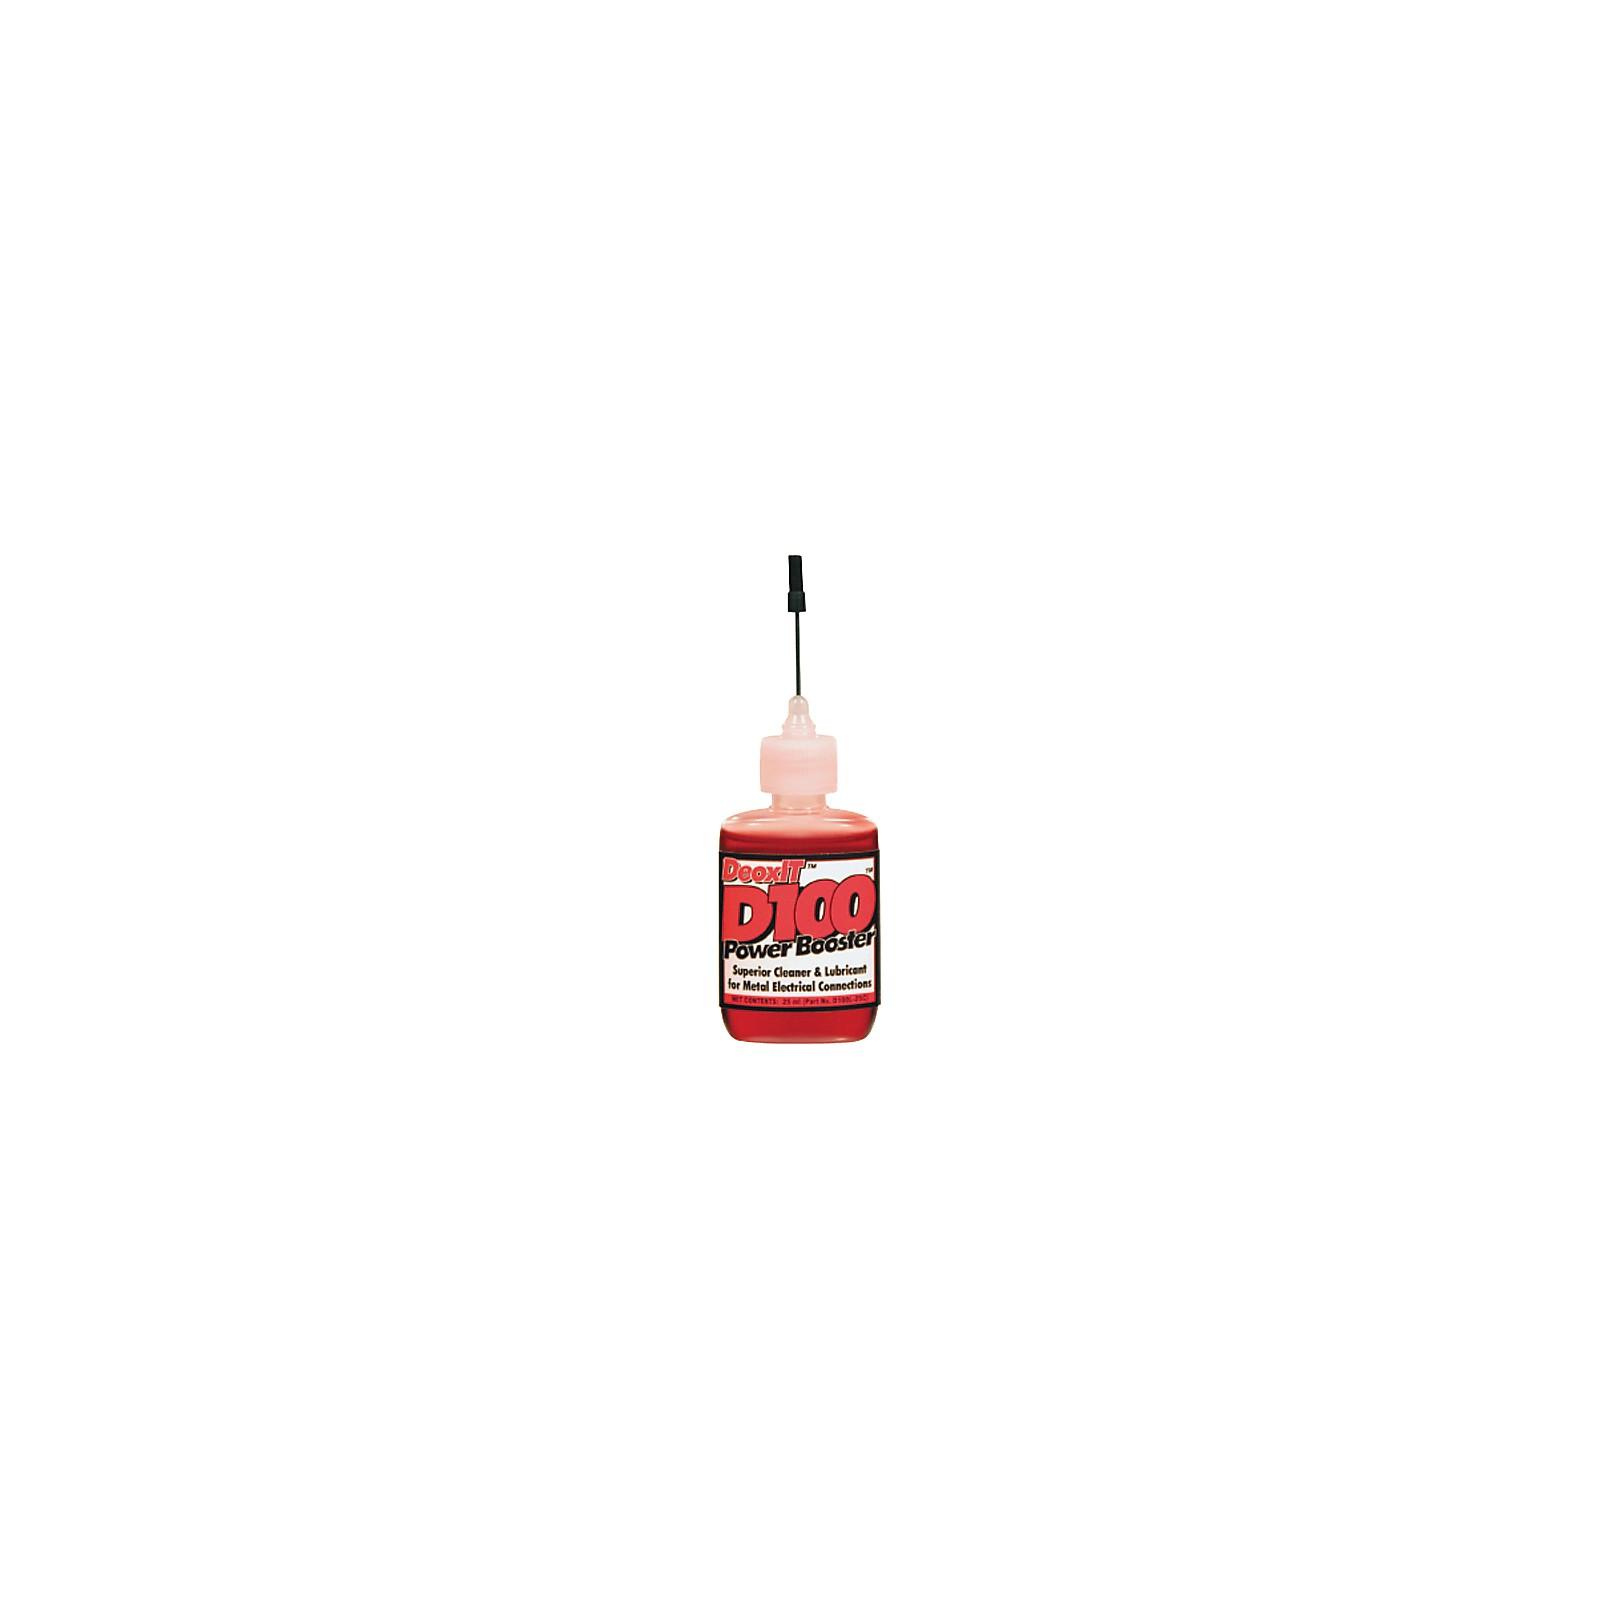 CAIG DeOxIT Liquid 25mL with Needle Applicator